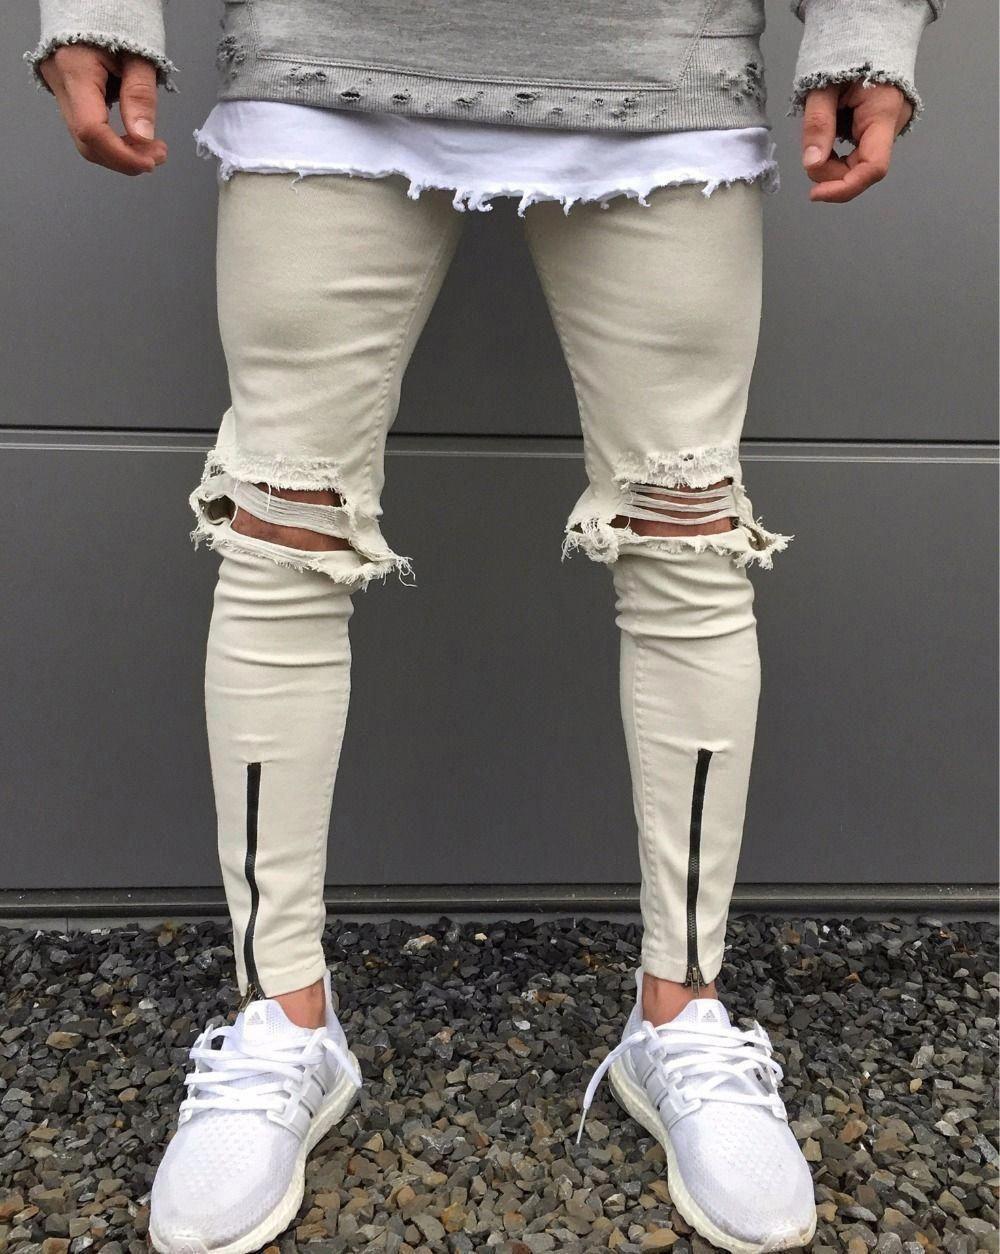 dcf3a3d6690ba 2017 Newest Fashion Tie-Dye Hole Destroyed Mens Hip Hop Denim Straight  Biker Skinny Jeans